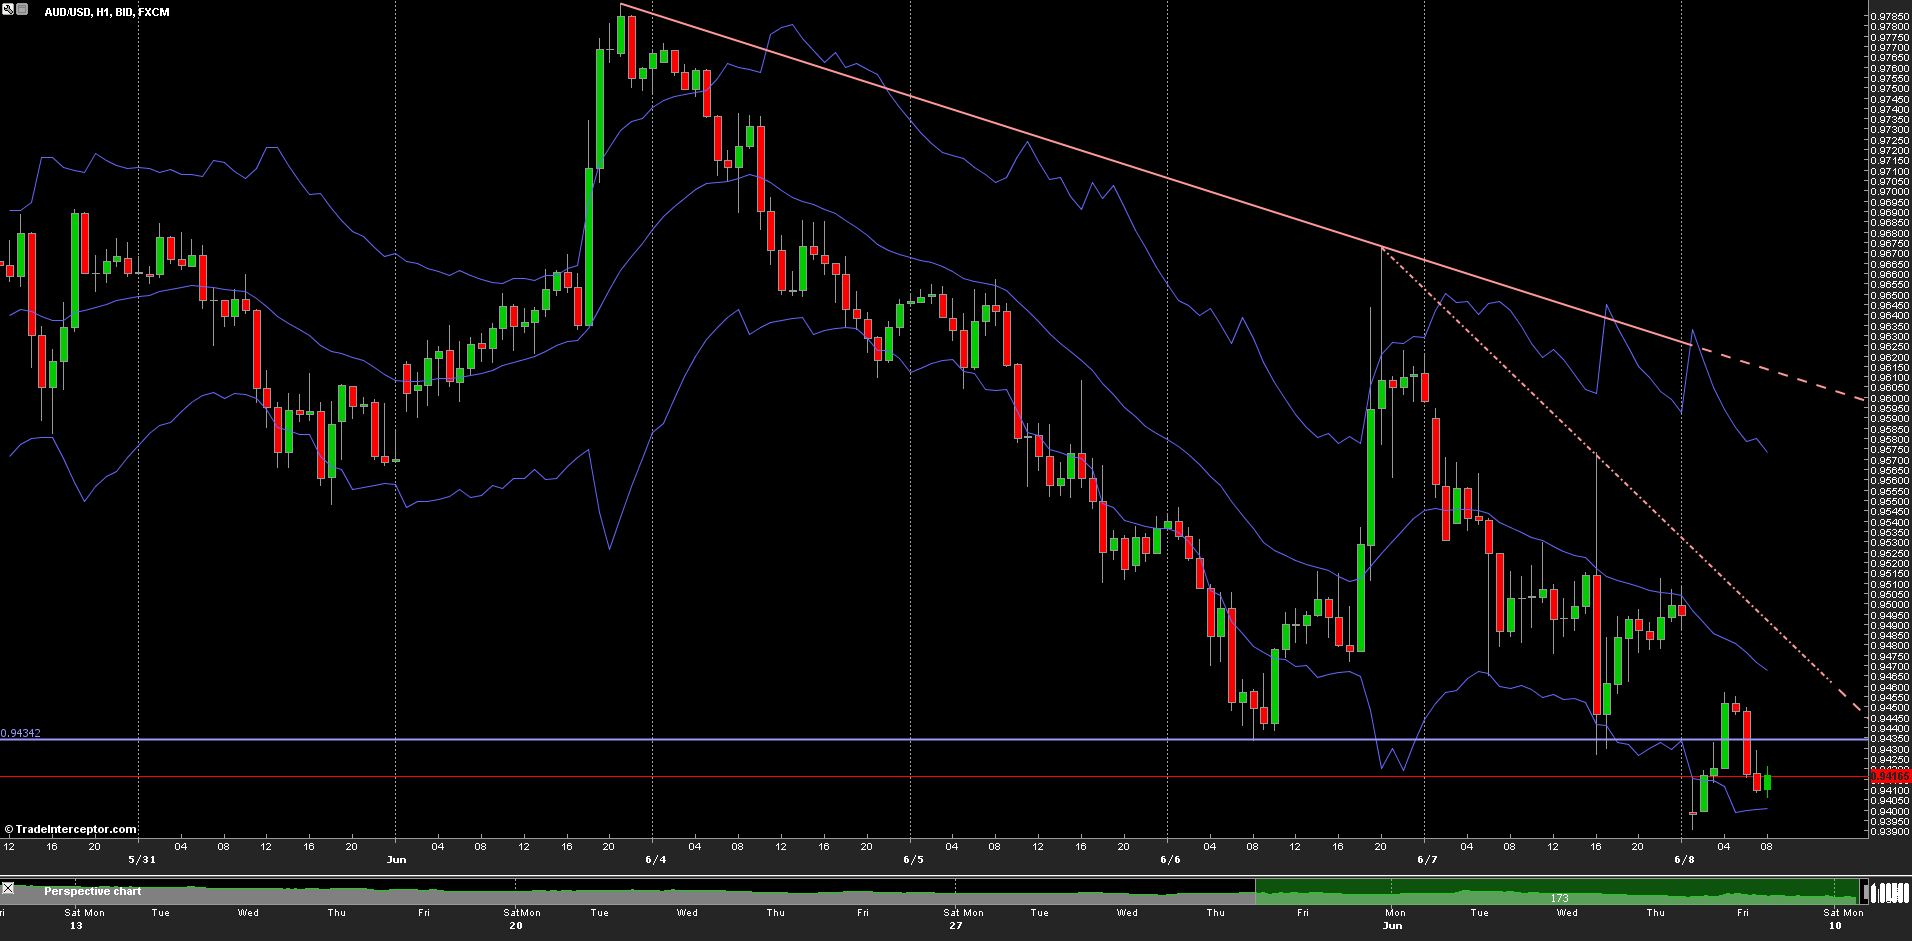 AUD/USD Chart 10/06/2013